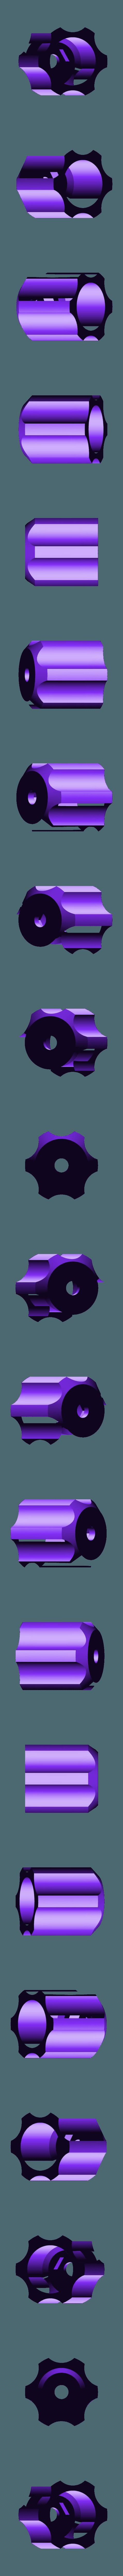 Geared_Extrude_tension_knob.stl Download free STL file FDM Printer de Kleine Reus 300x300x900 • 3D printable object, Job